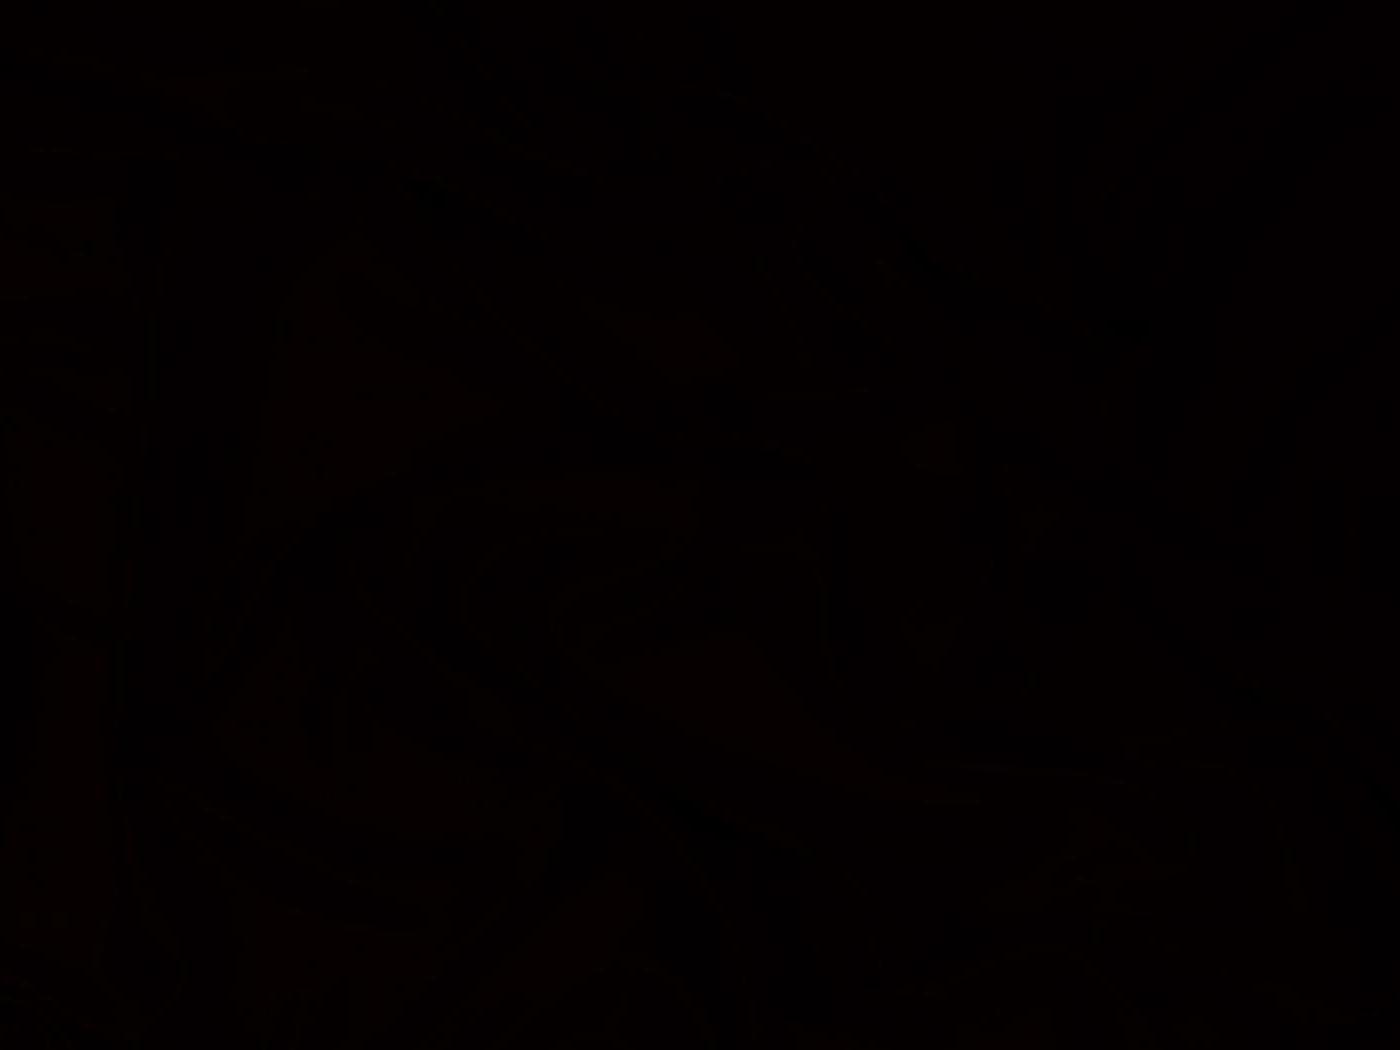 s3 wallpaper black - photo #19